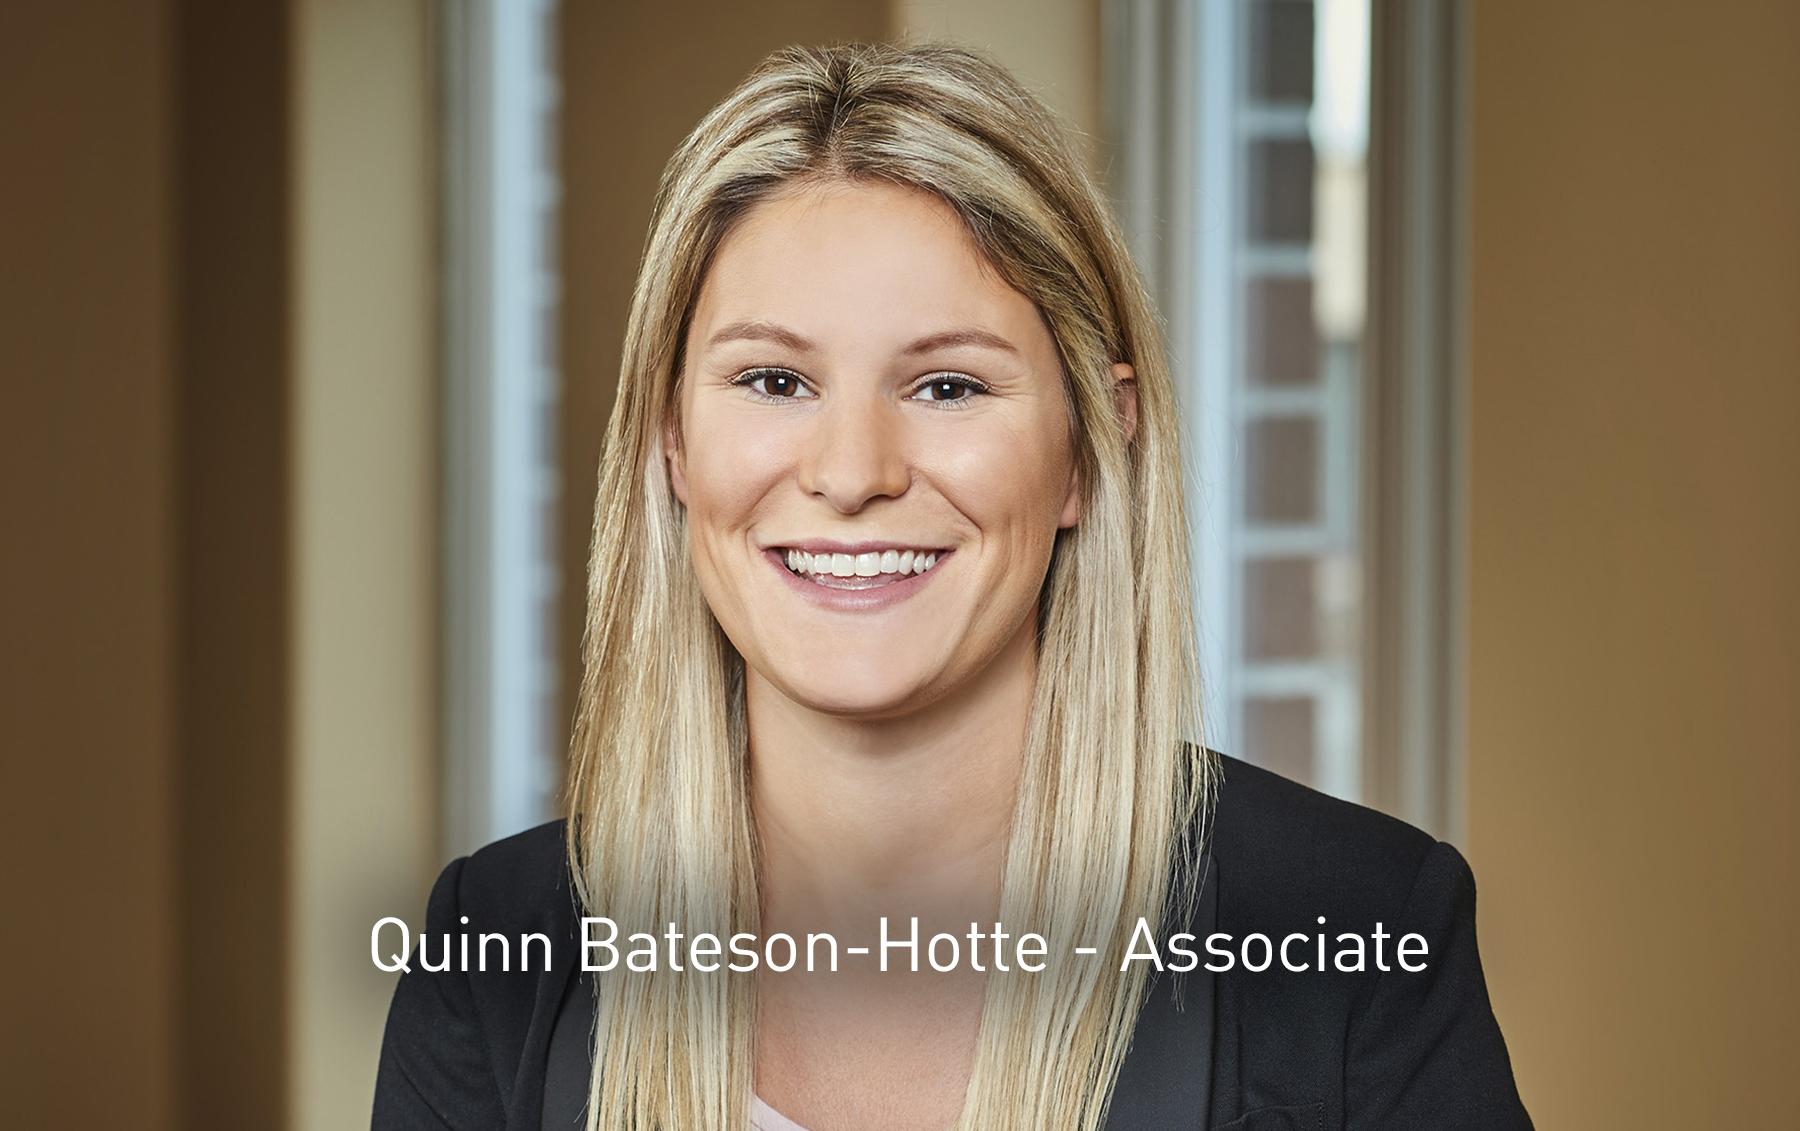 Quinn_Bateson_Hotte_Associate